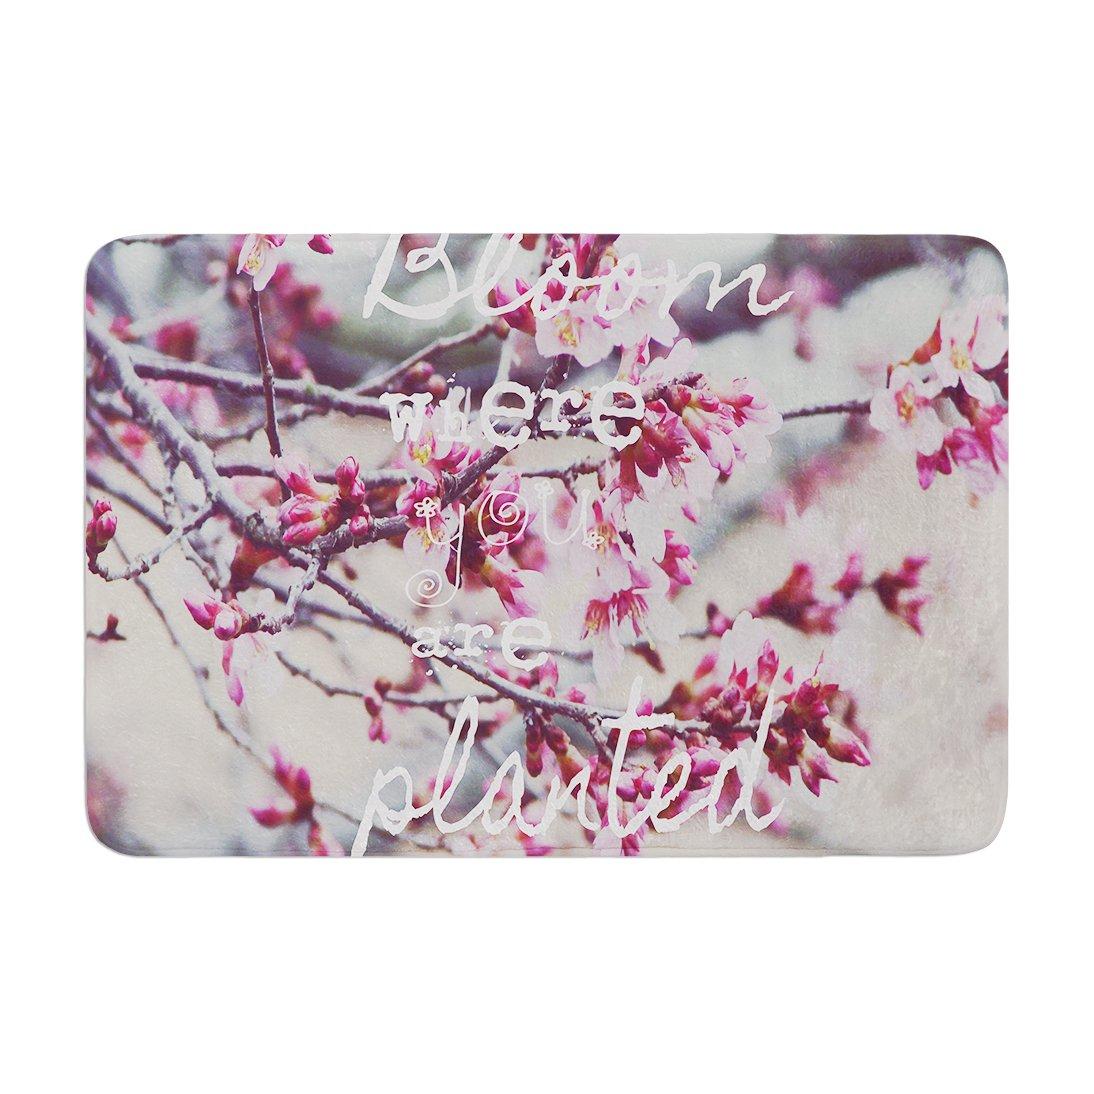 17 by 24 Kess InHouse Suzanne Carter Bloom Pink Memory Foam Bath Mat